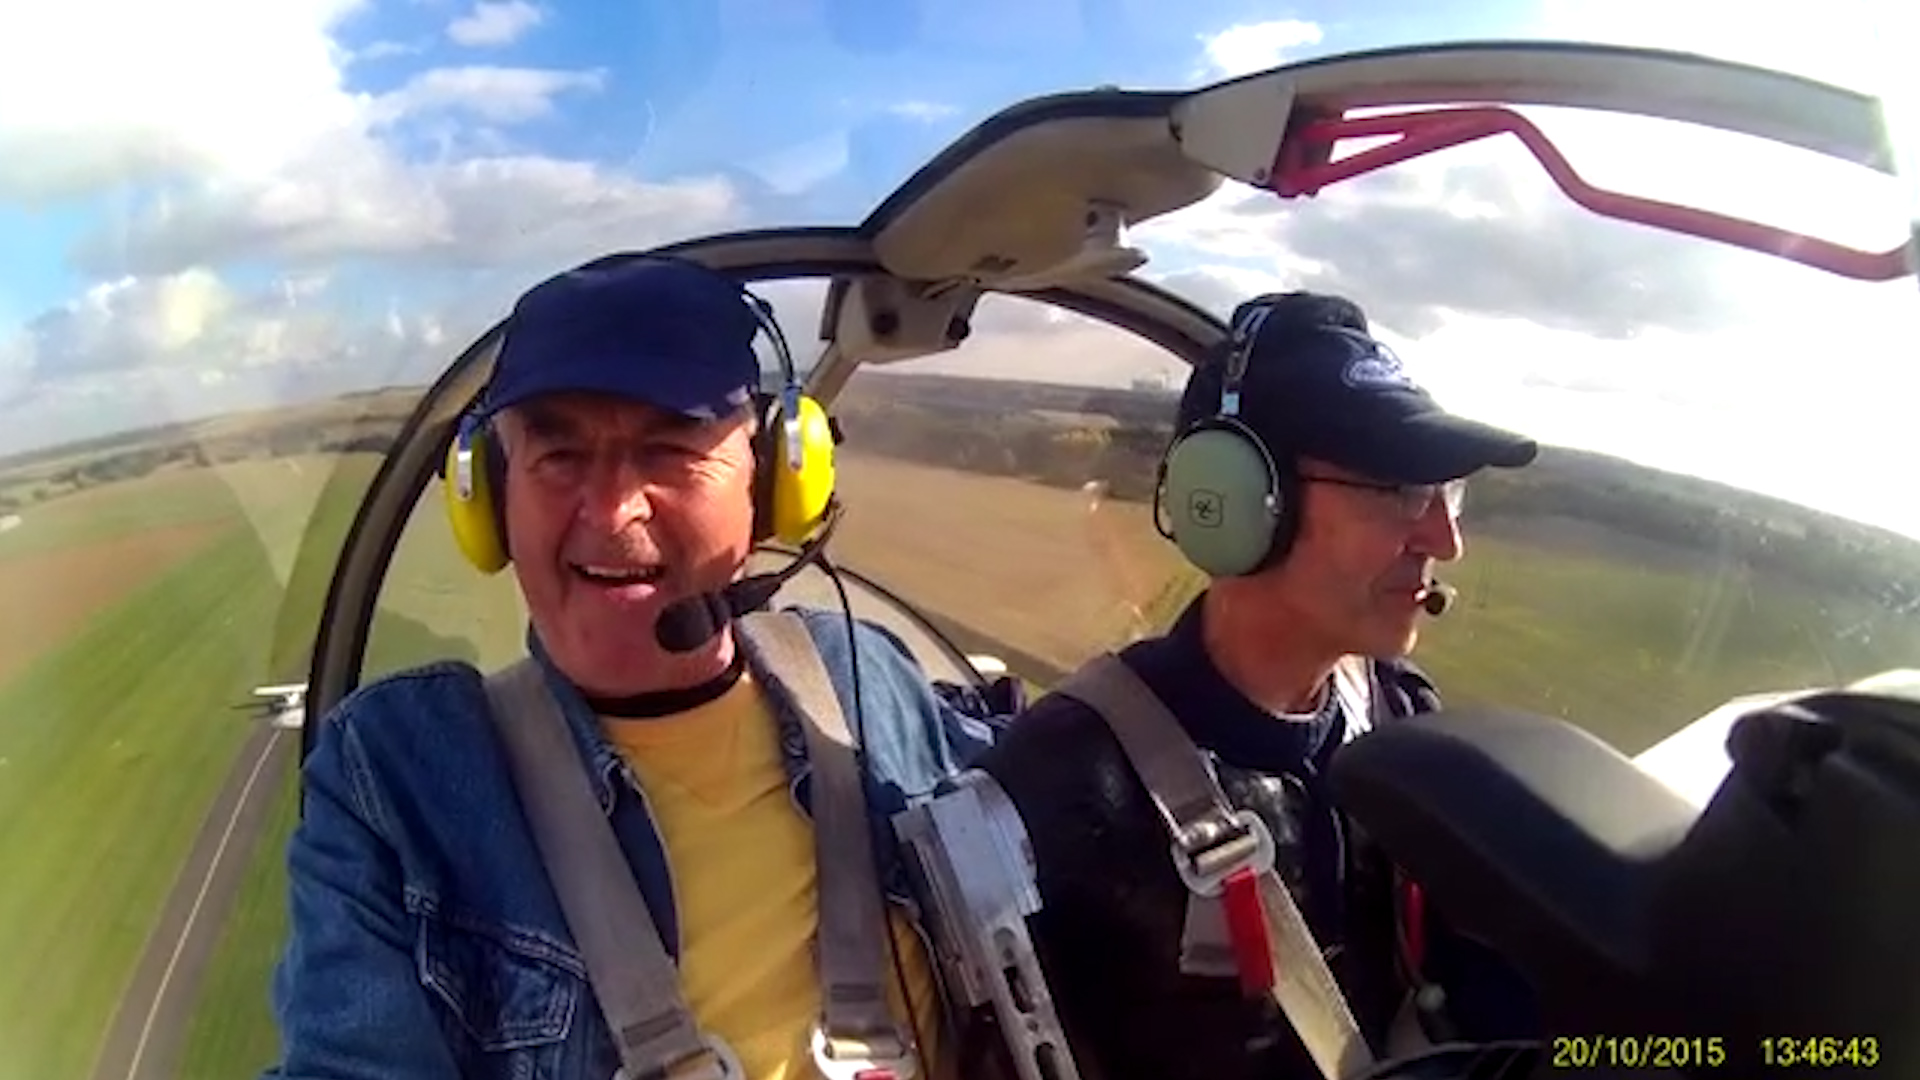 Steve takes to the skies